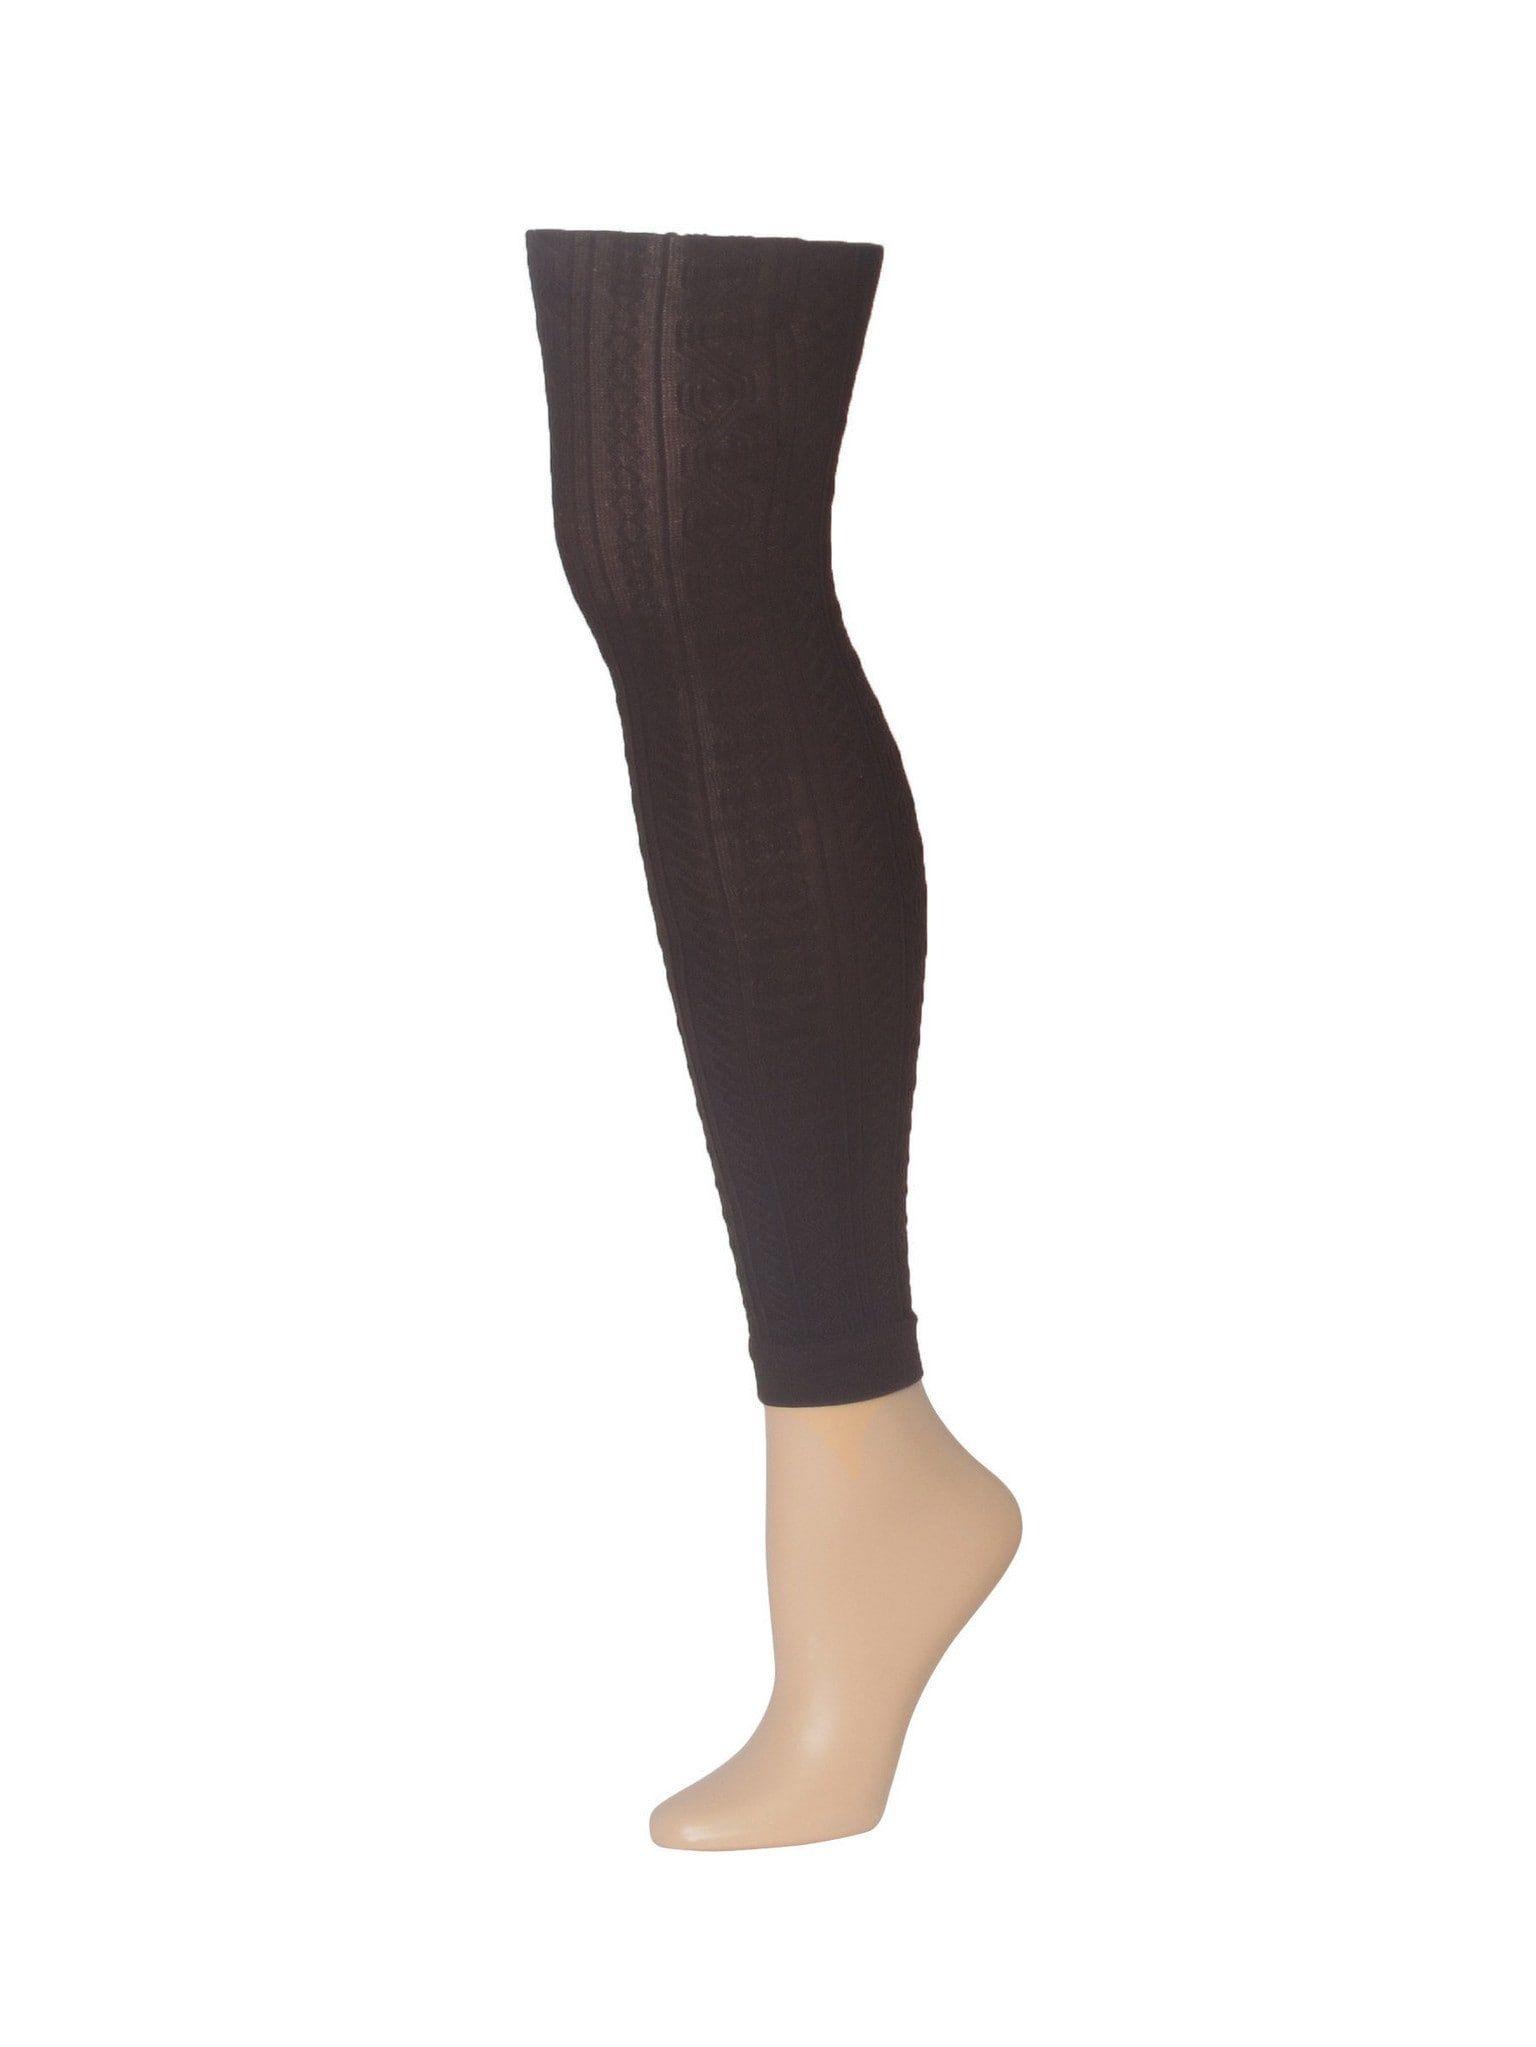 6b63fde5c MeMoi Textured Footless Tights MeMoi Women s Tights - Hosiery - Pantyhose  Queen1 Queen2   Black MO 323 Tights